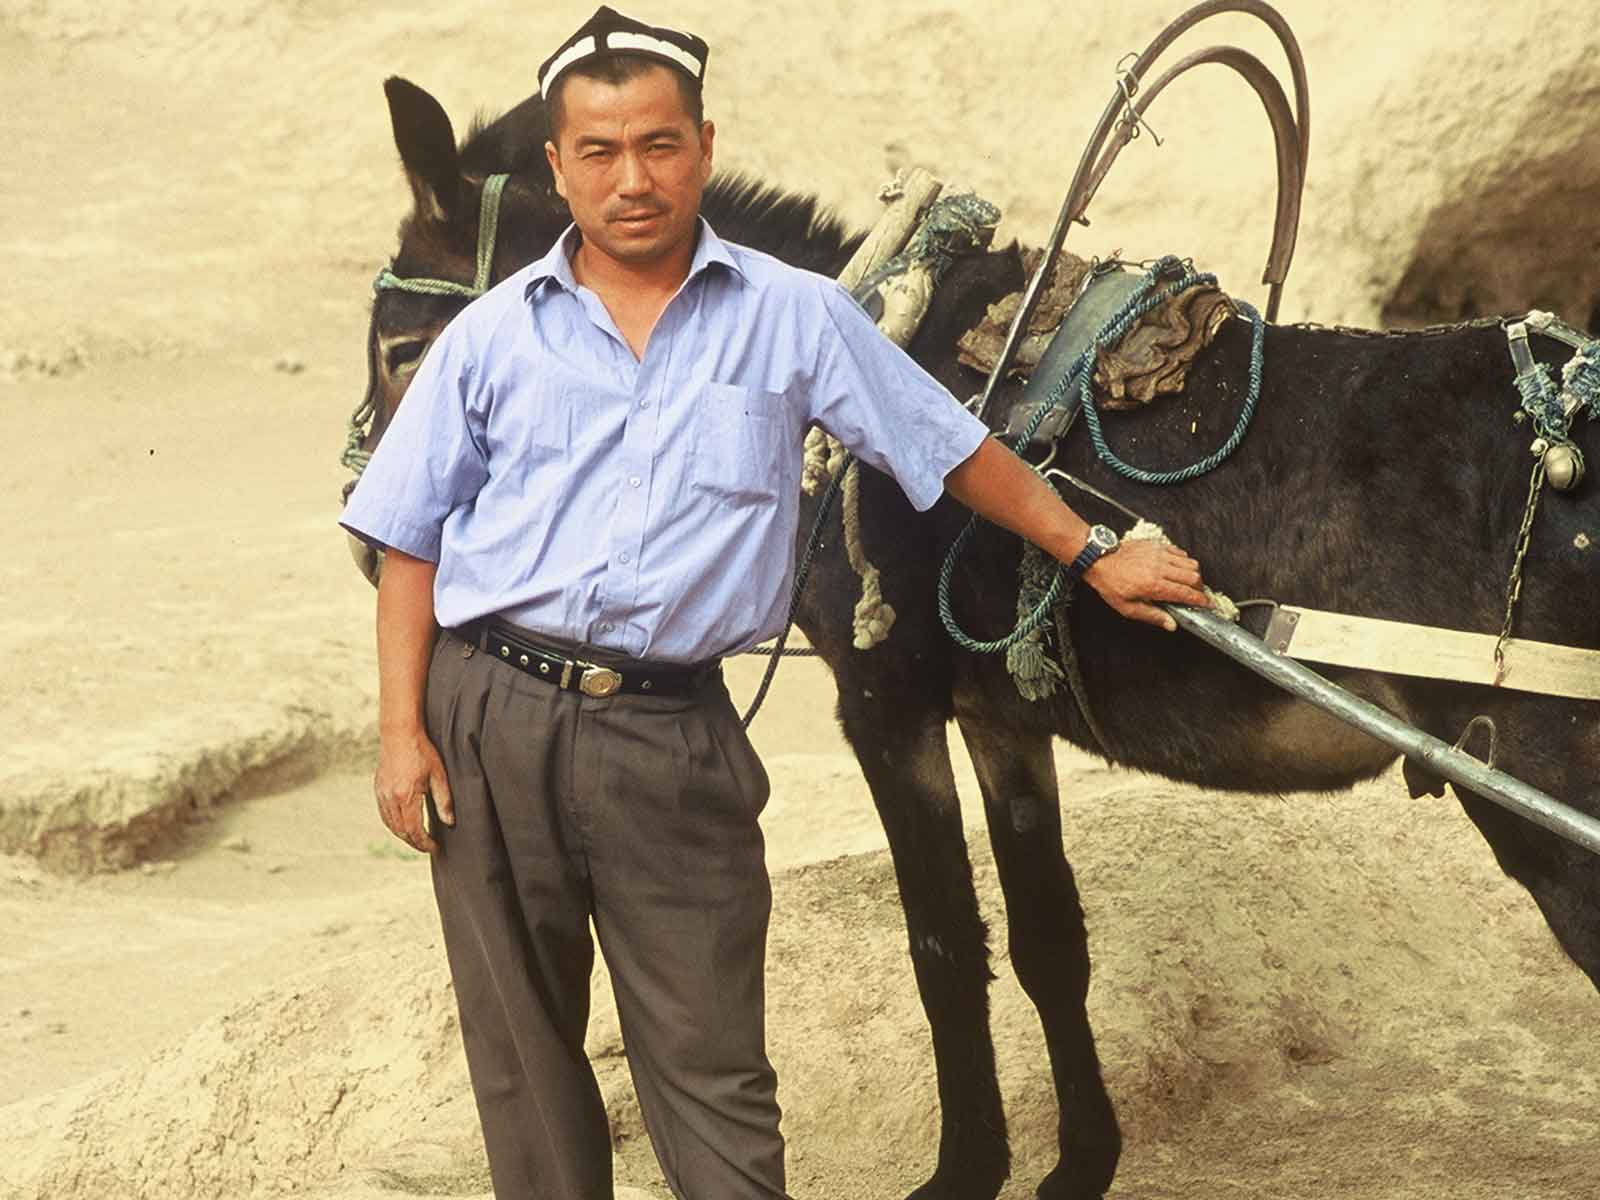 Gaochang ruins - Uyghur-Taxi - China Silk Road - Steven Andrew Martin - Study Abroad Journal 2001